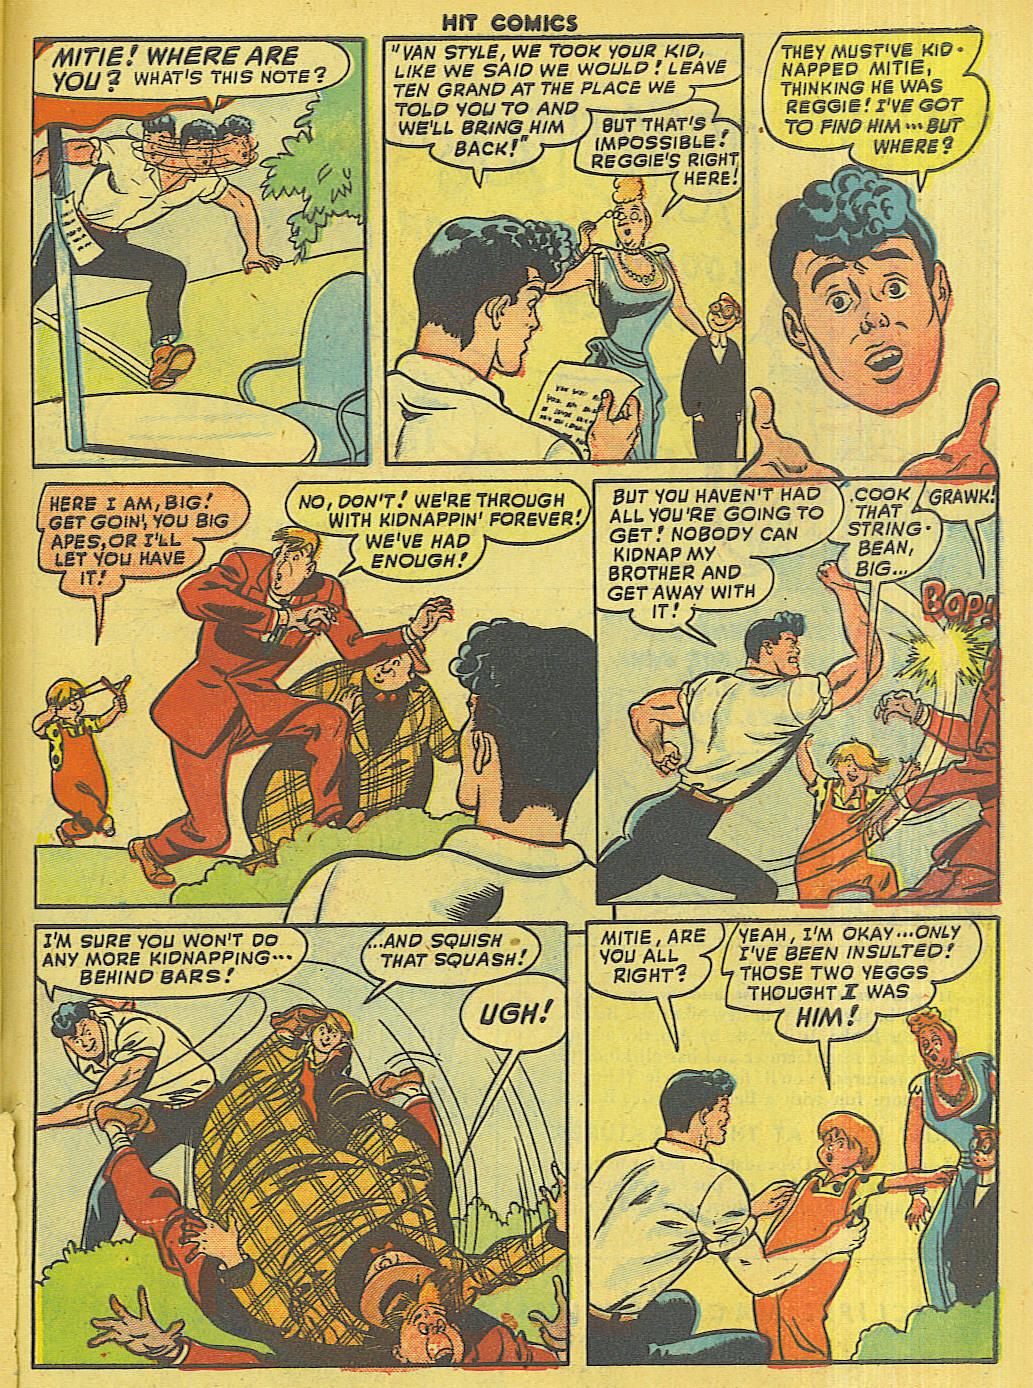 Read online Hit Comics comic -  Issue #56 - 47